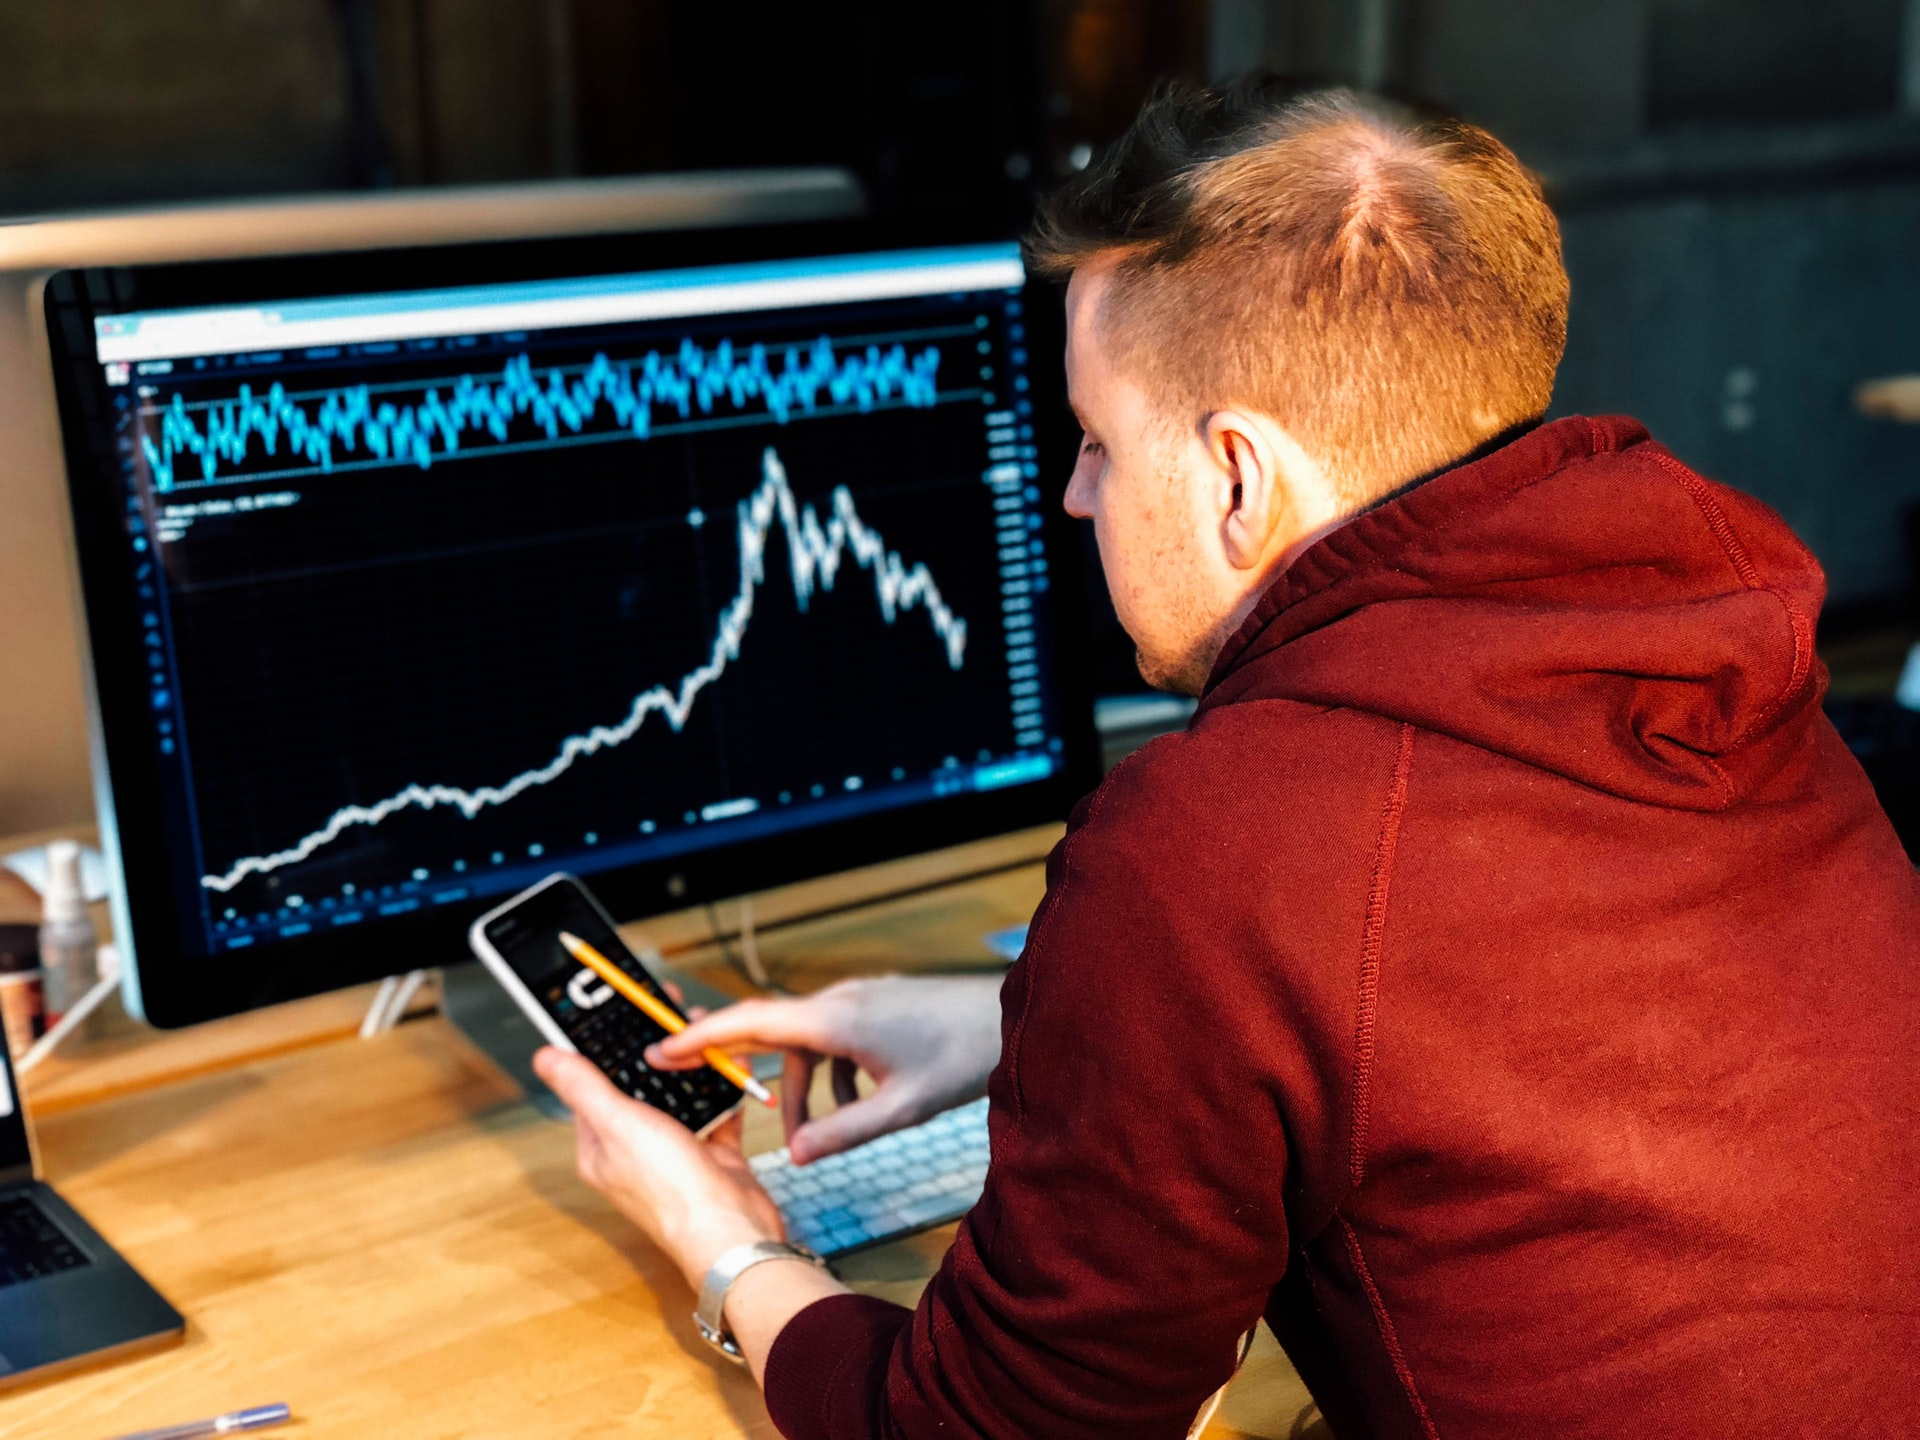 Iota Kurs Prognose – Kann der Kurs auf $4 (+275%) ansteigen?